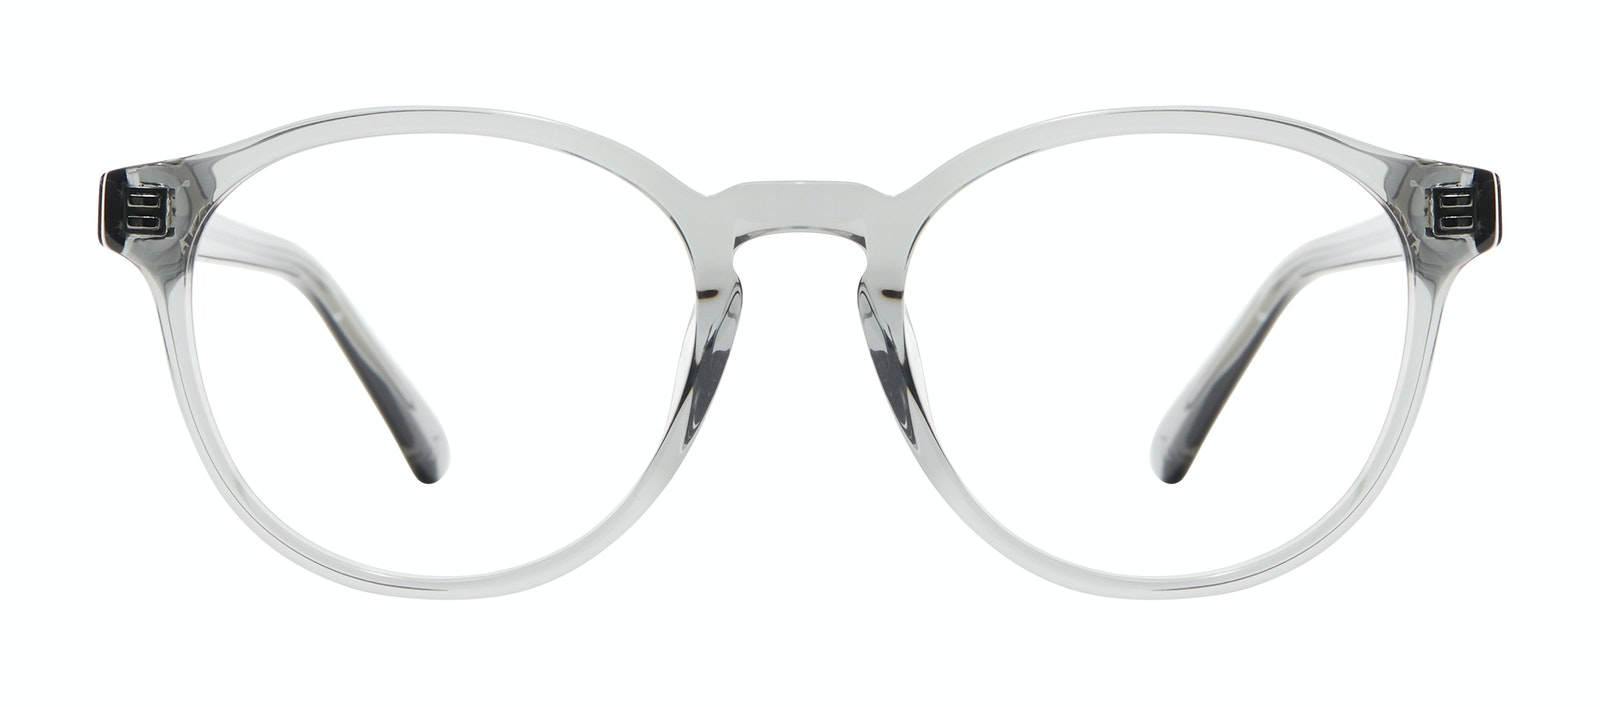 Affordable Fashion Glasses Round Eyeglasses Men Aussie Storm Front